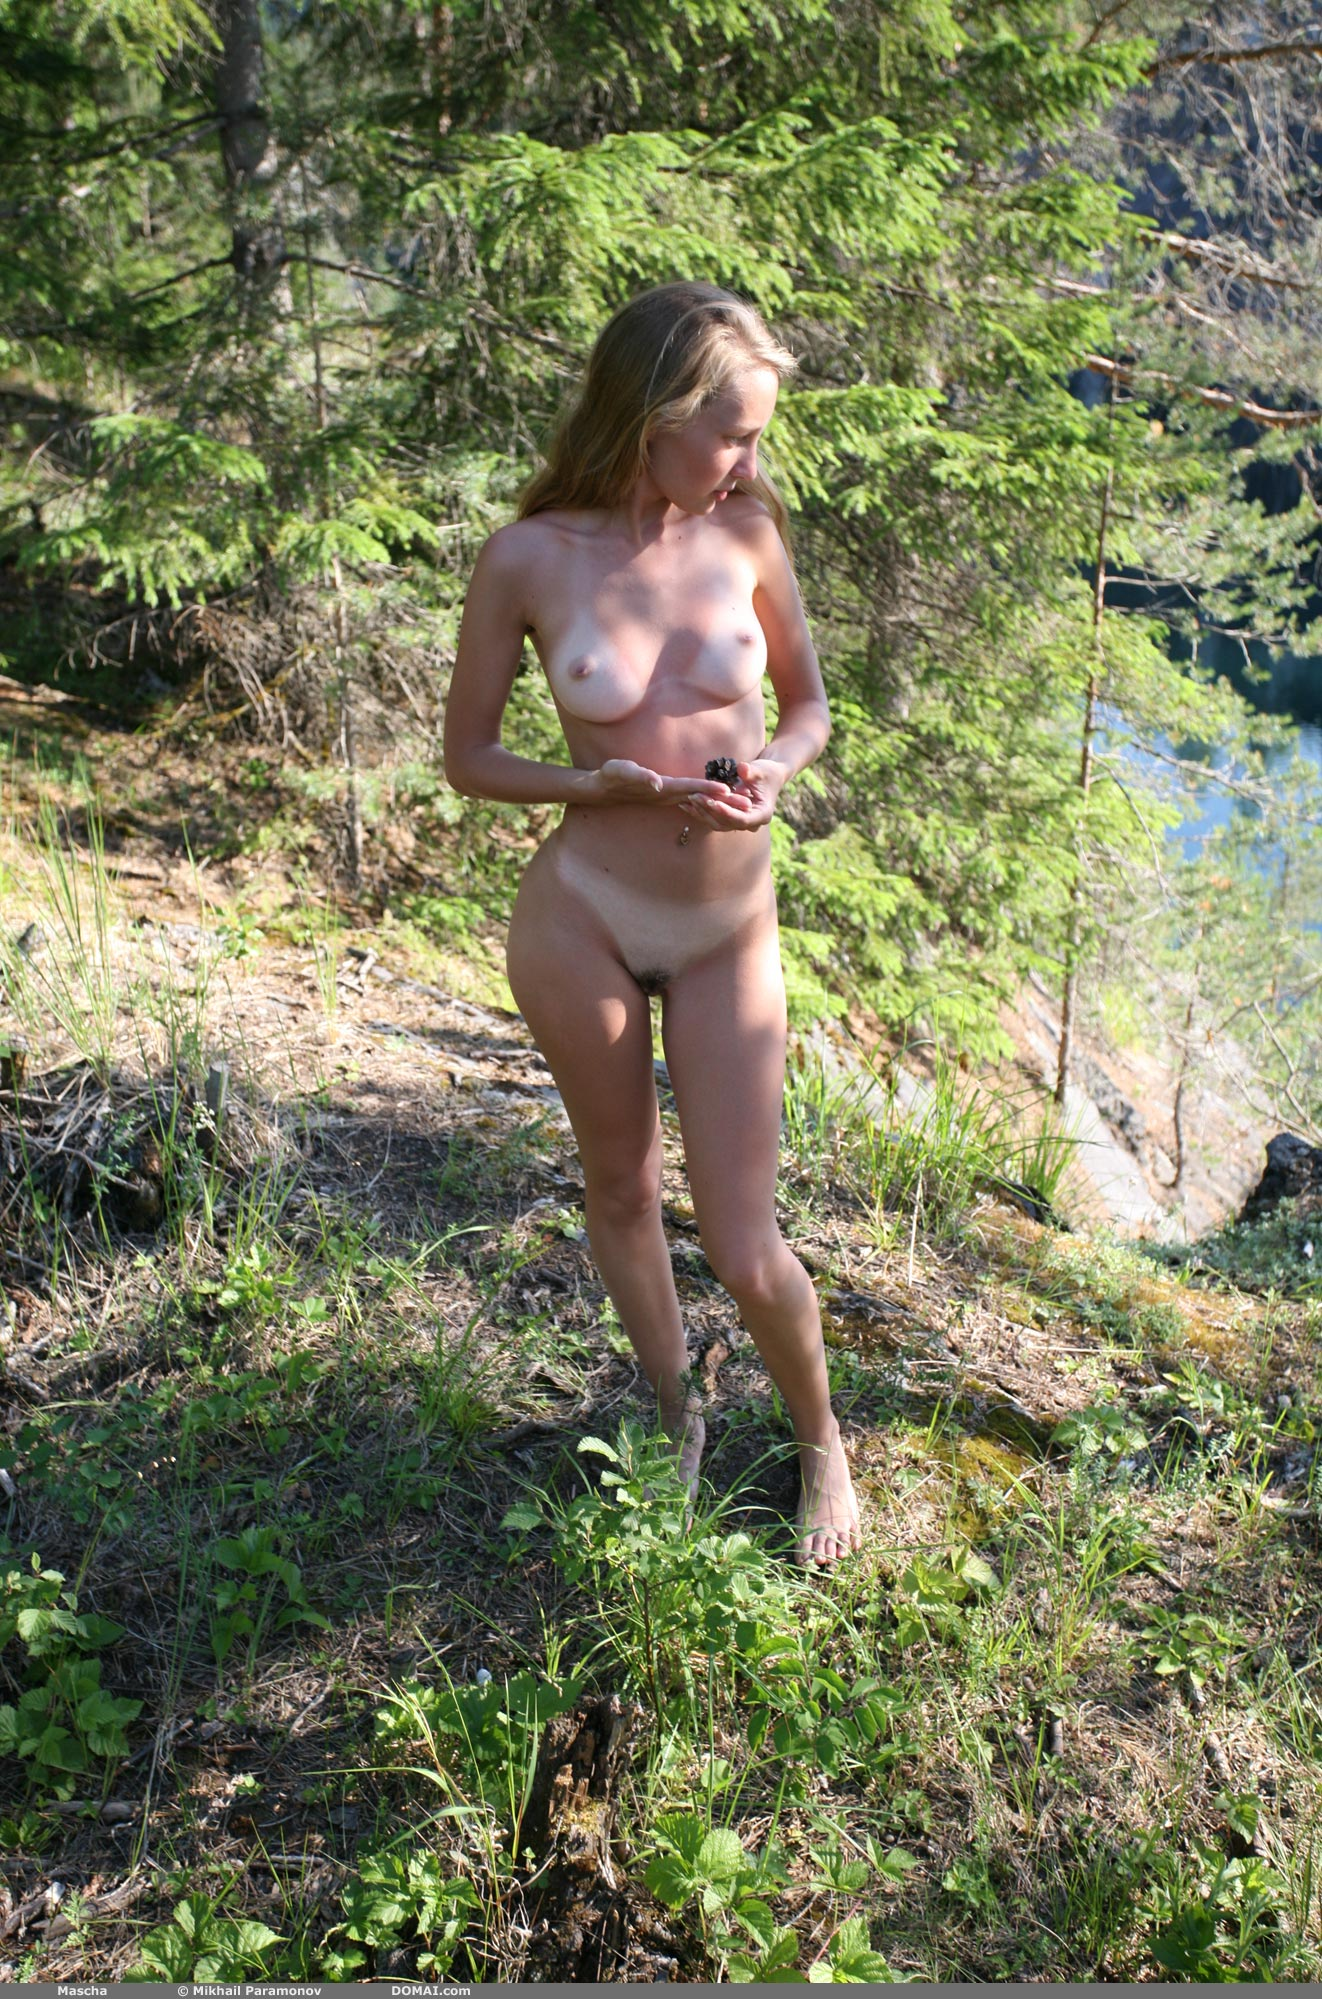 Mascha Stripping - NudesPuri.com